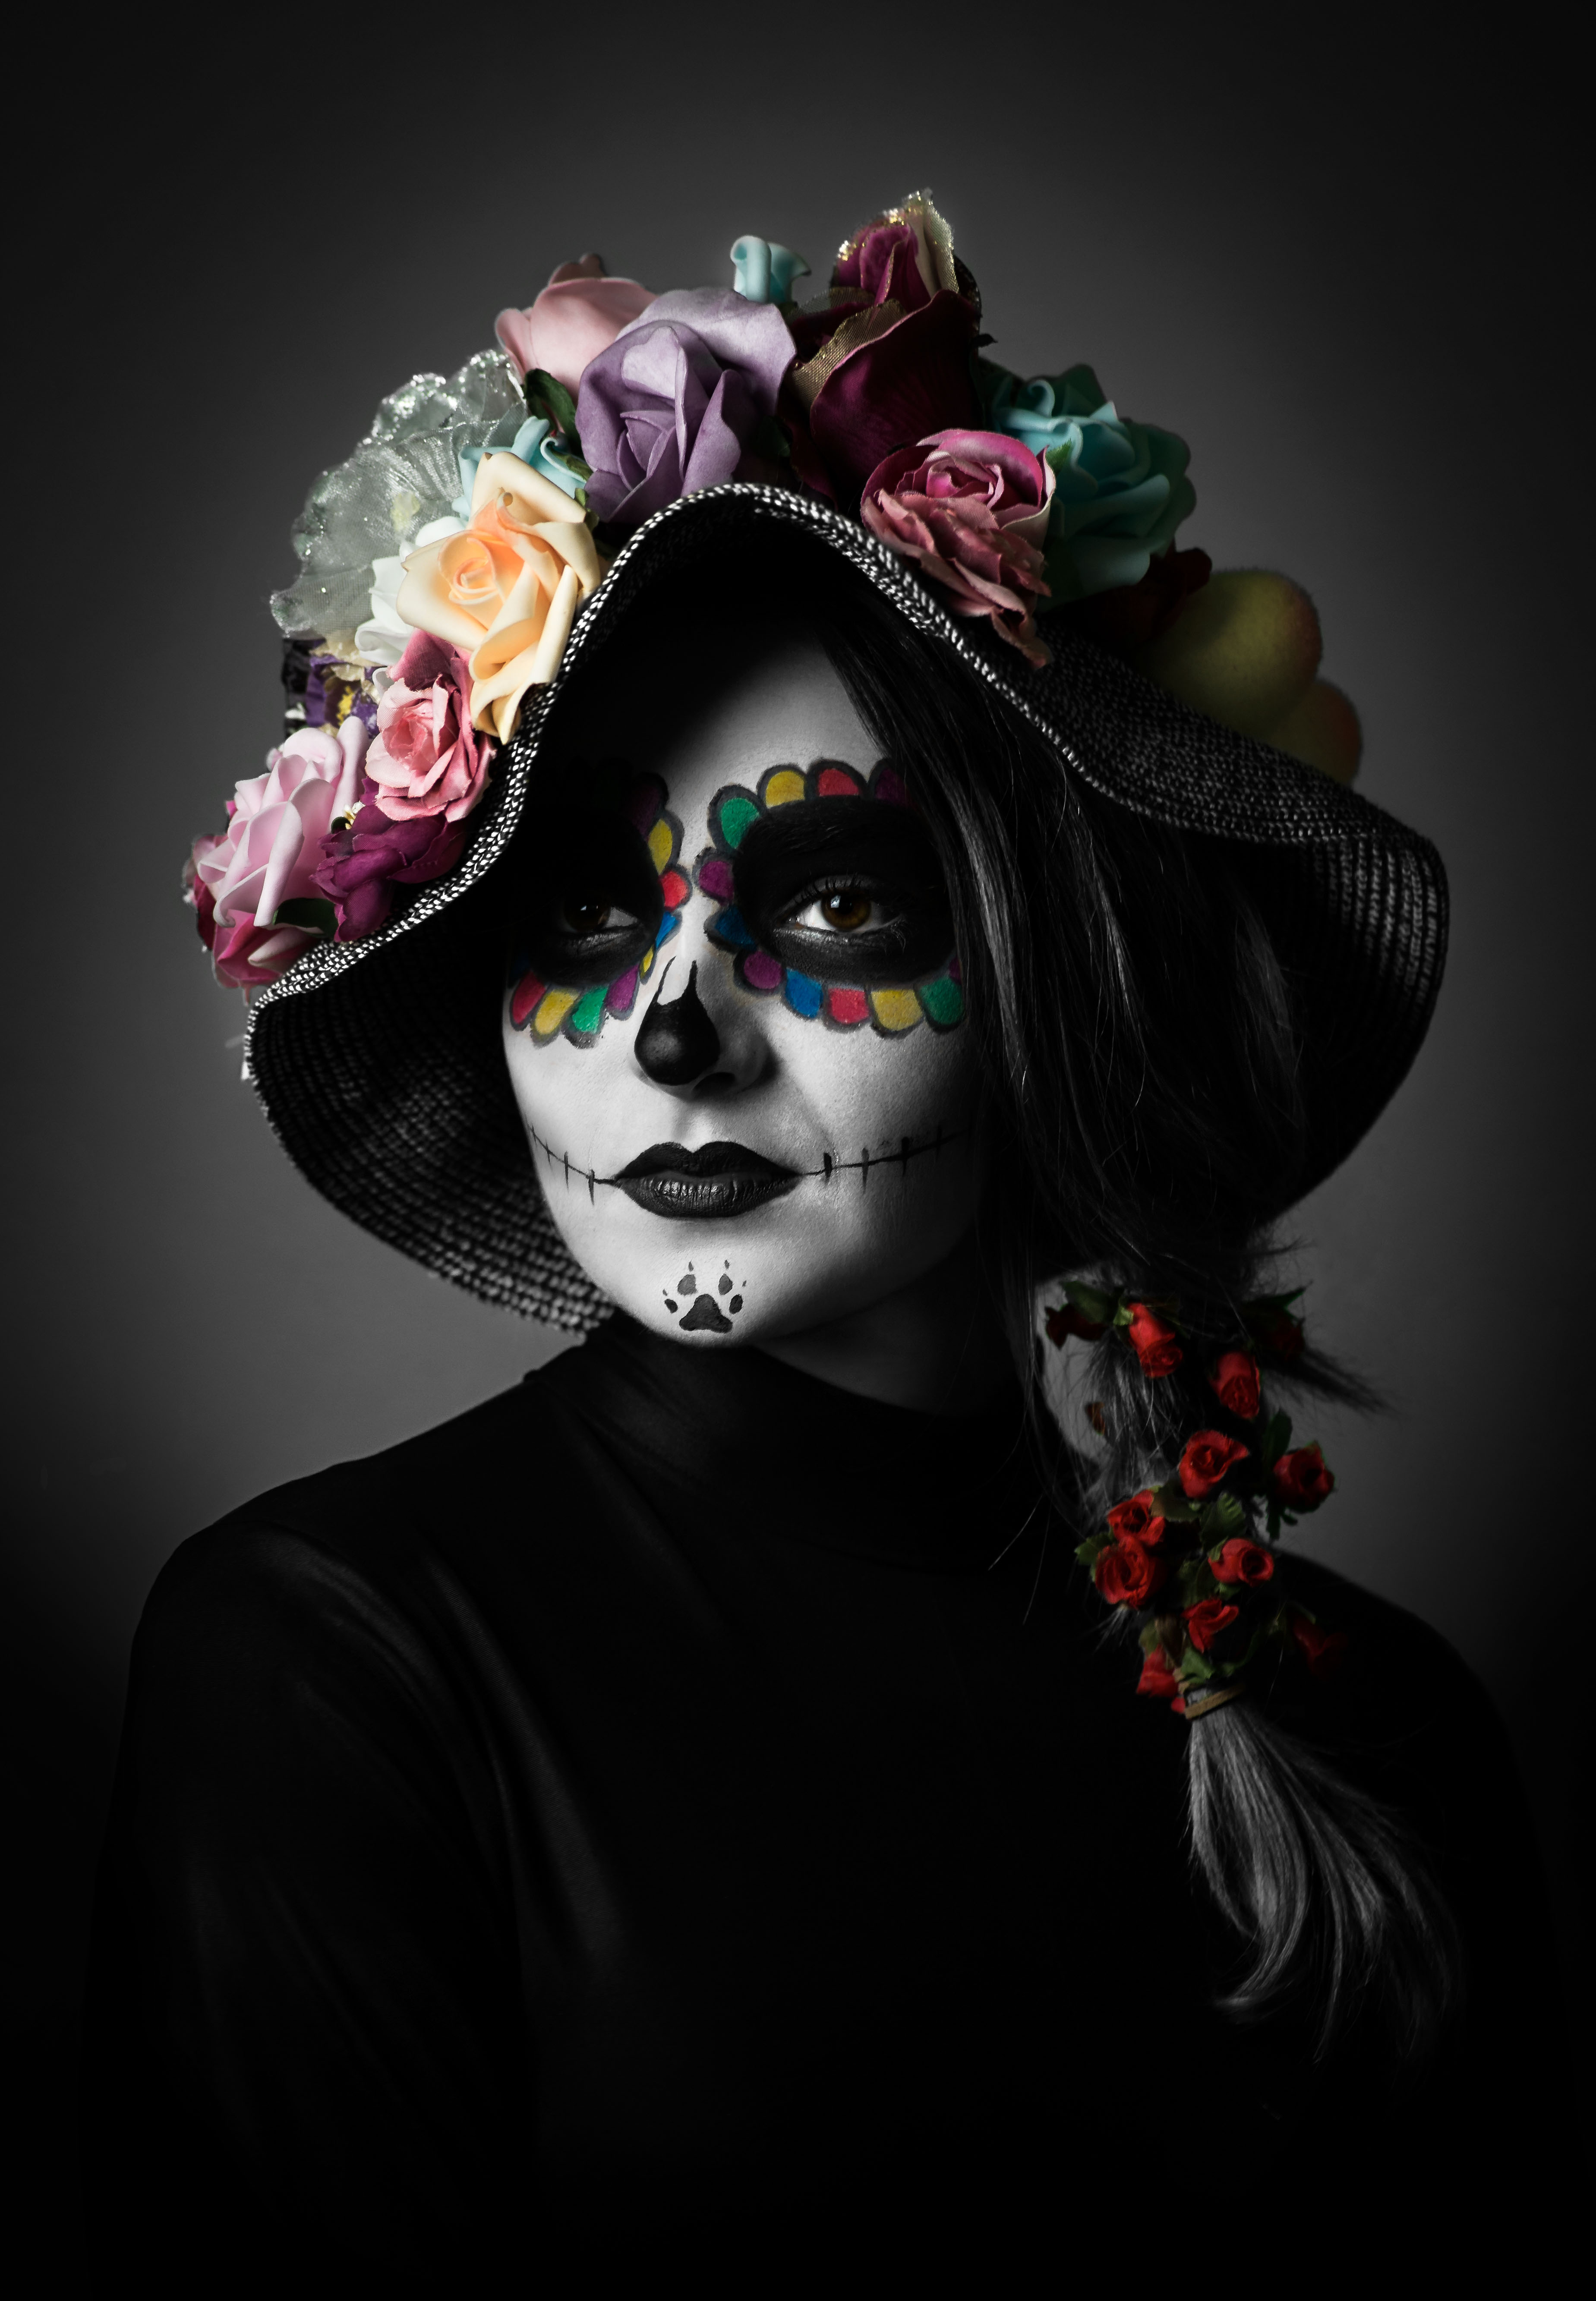 coronite costume de halloween